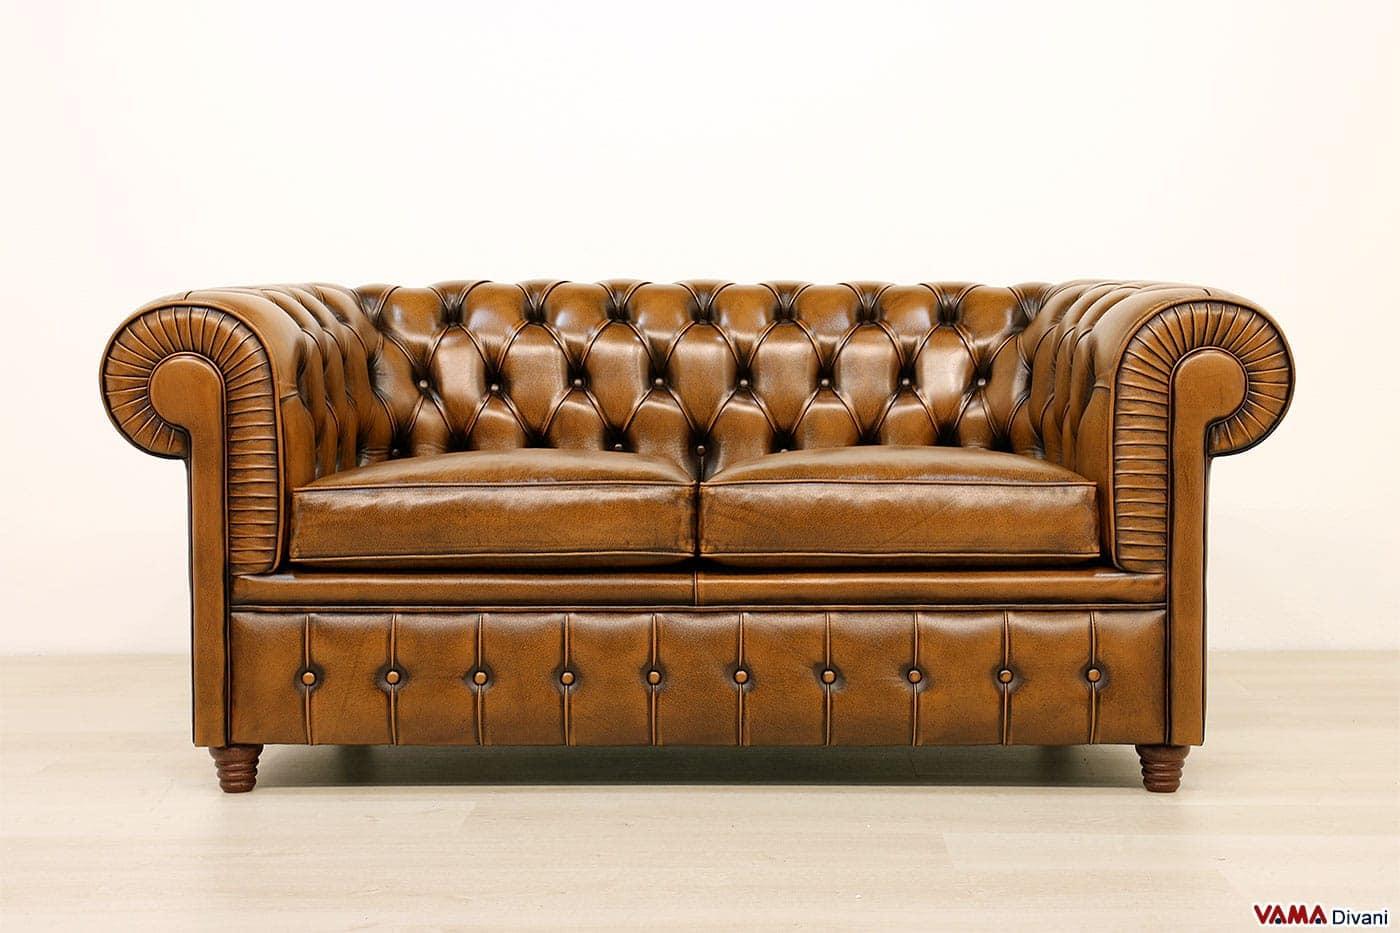 usato divani - 28 images - divano pelle usato 64 images divano pelle ...